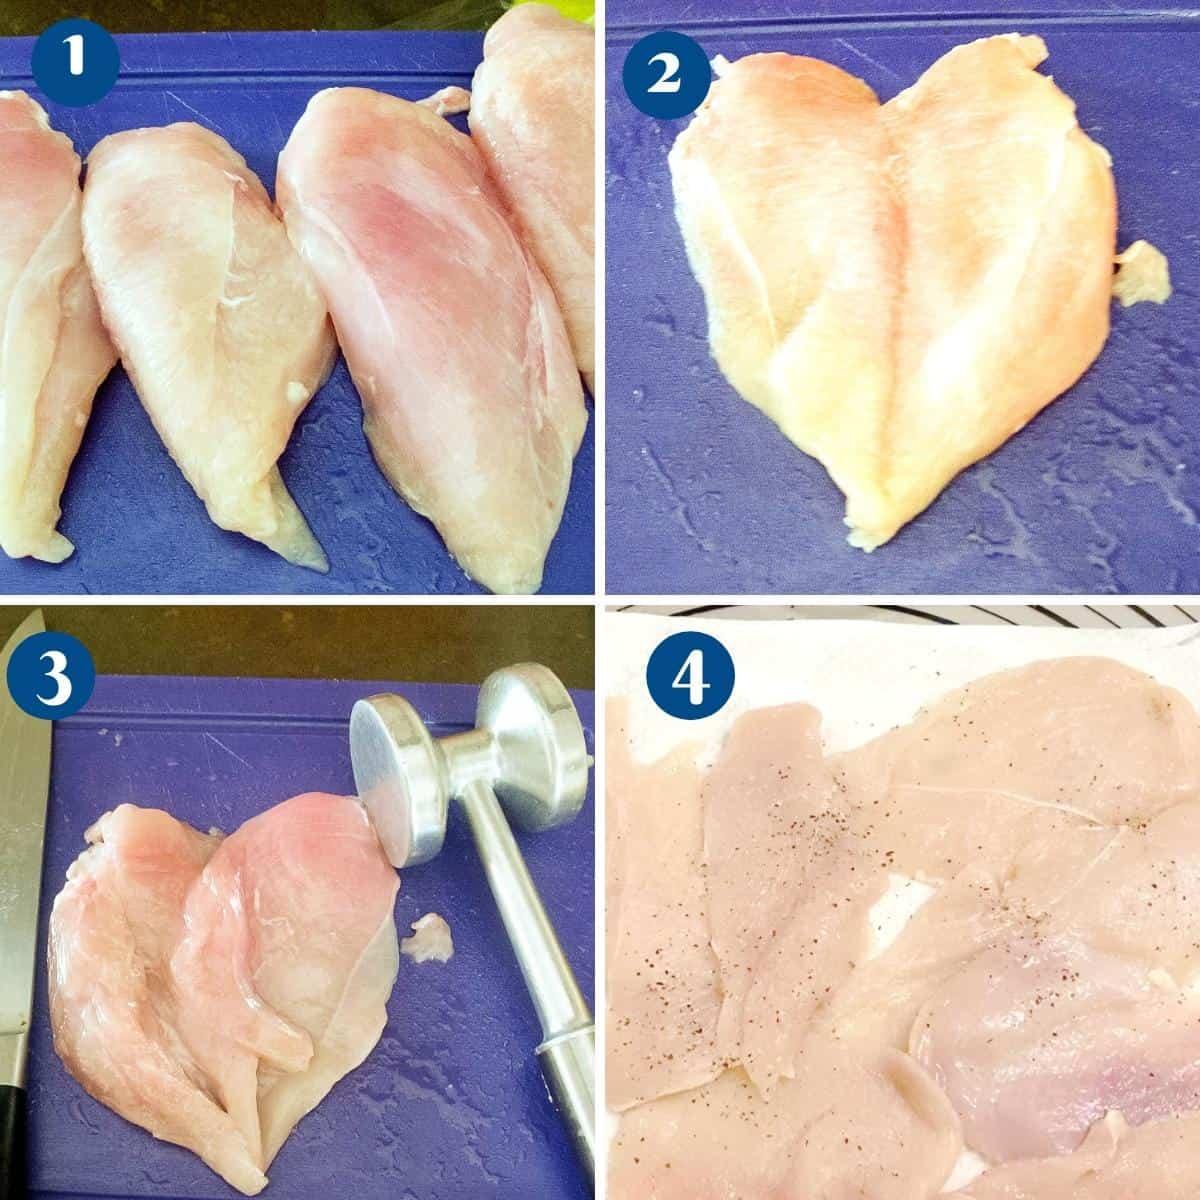 Progress pictures preparing the chicken breast.